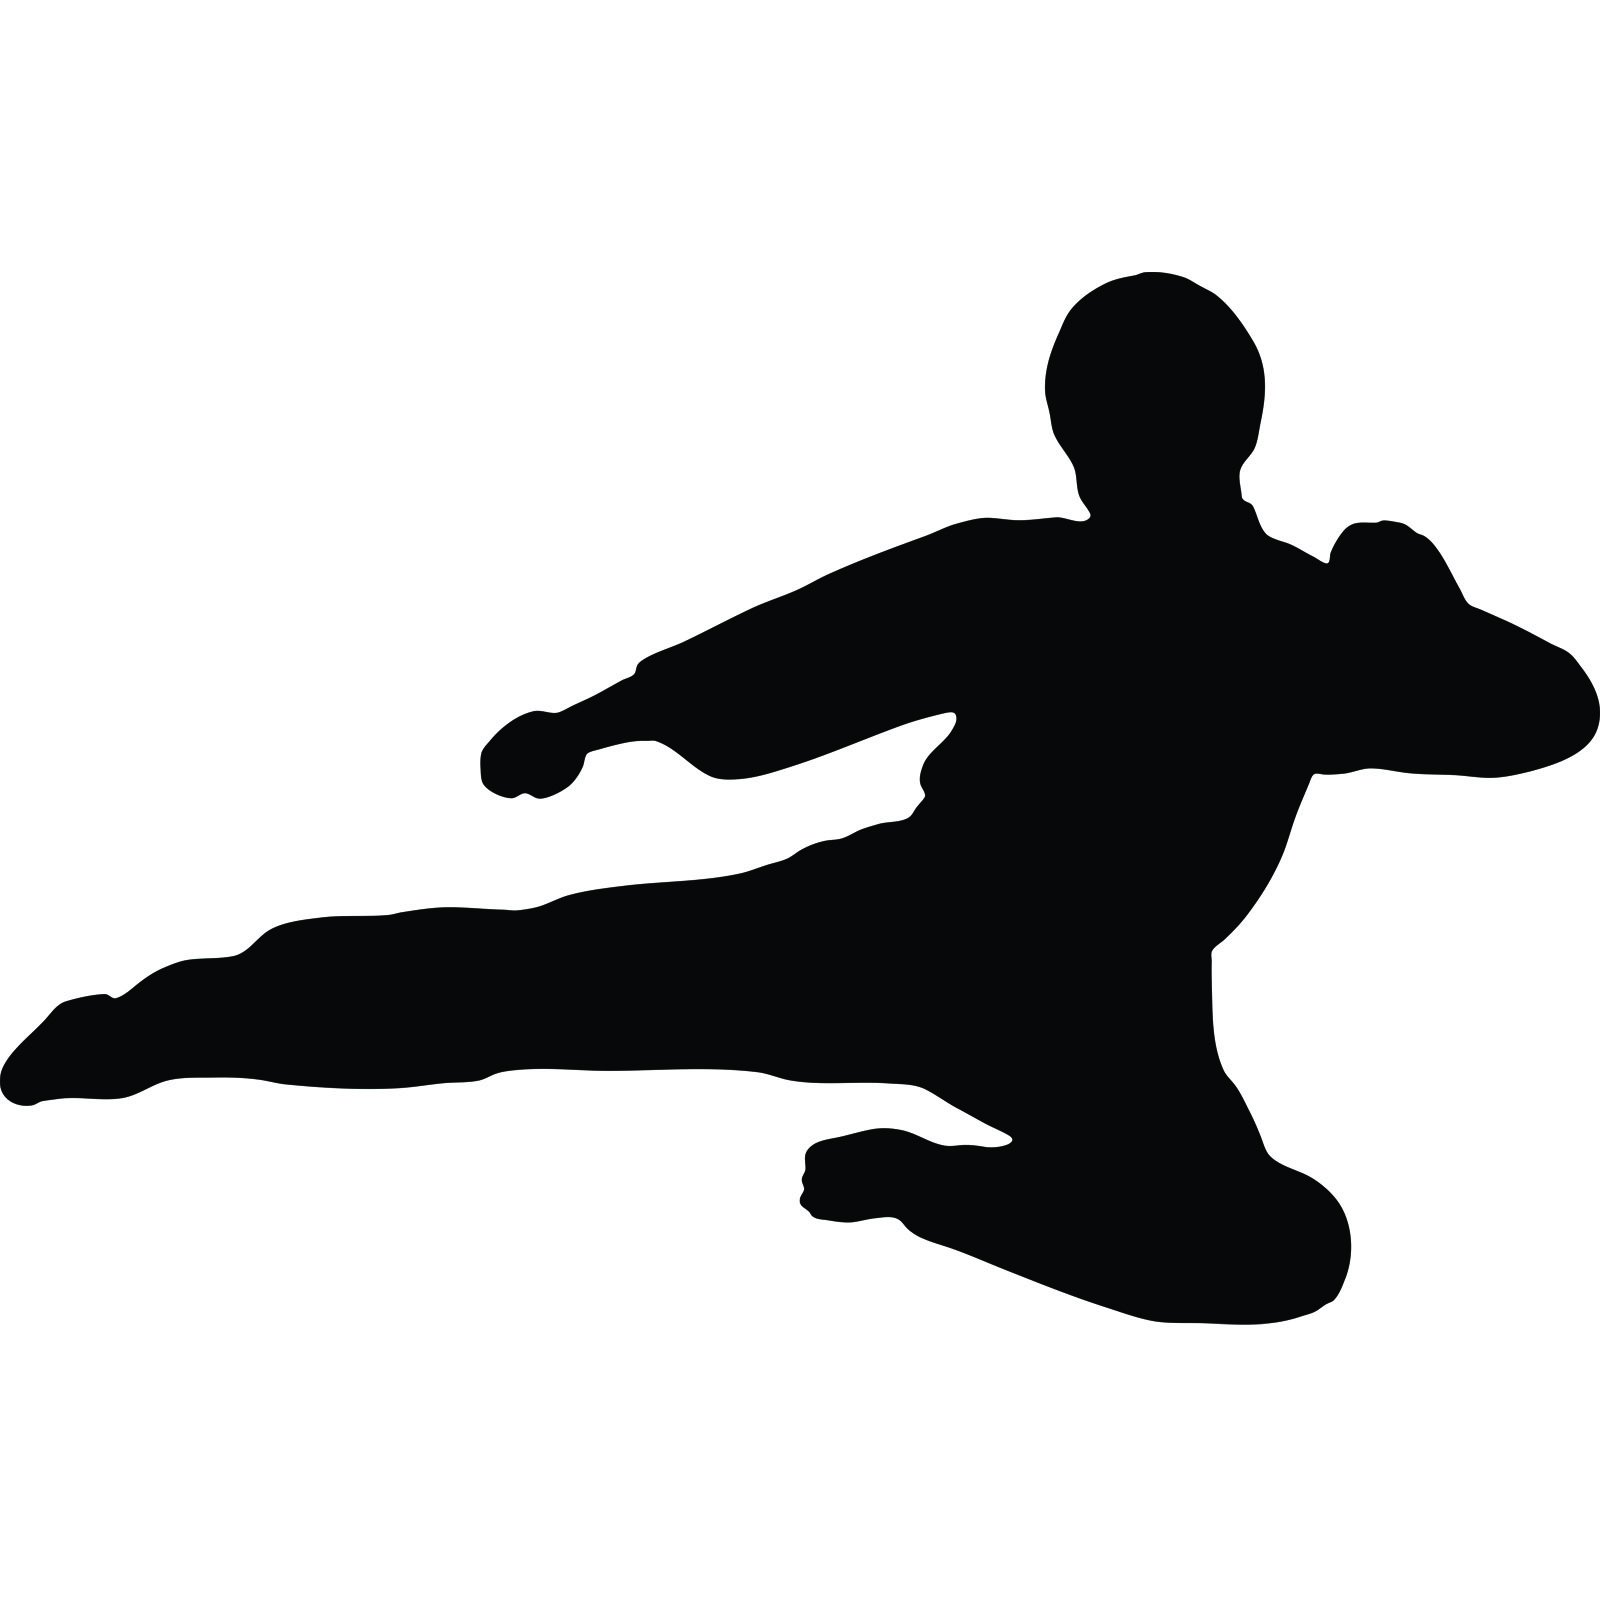 Mirrored Wall Art Stickers Martial Arts Flying Kick V2 Karate Kung Fu Wall Sticker